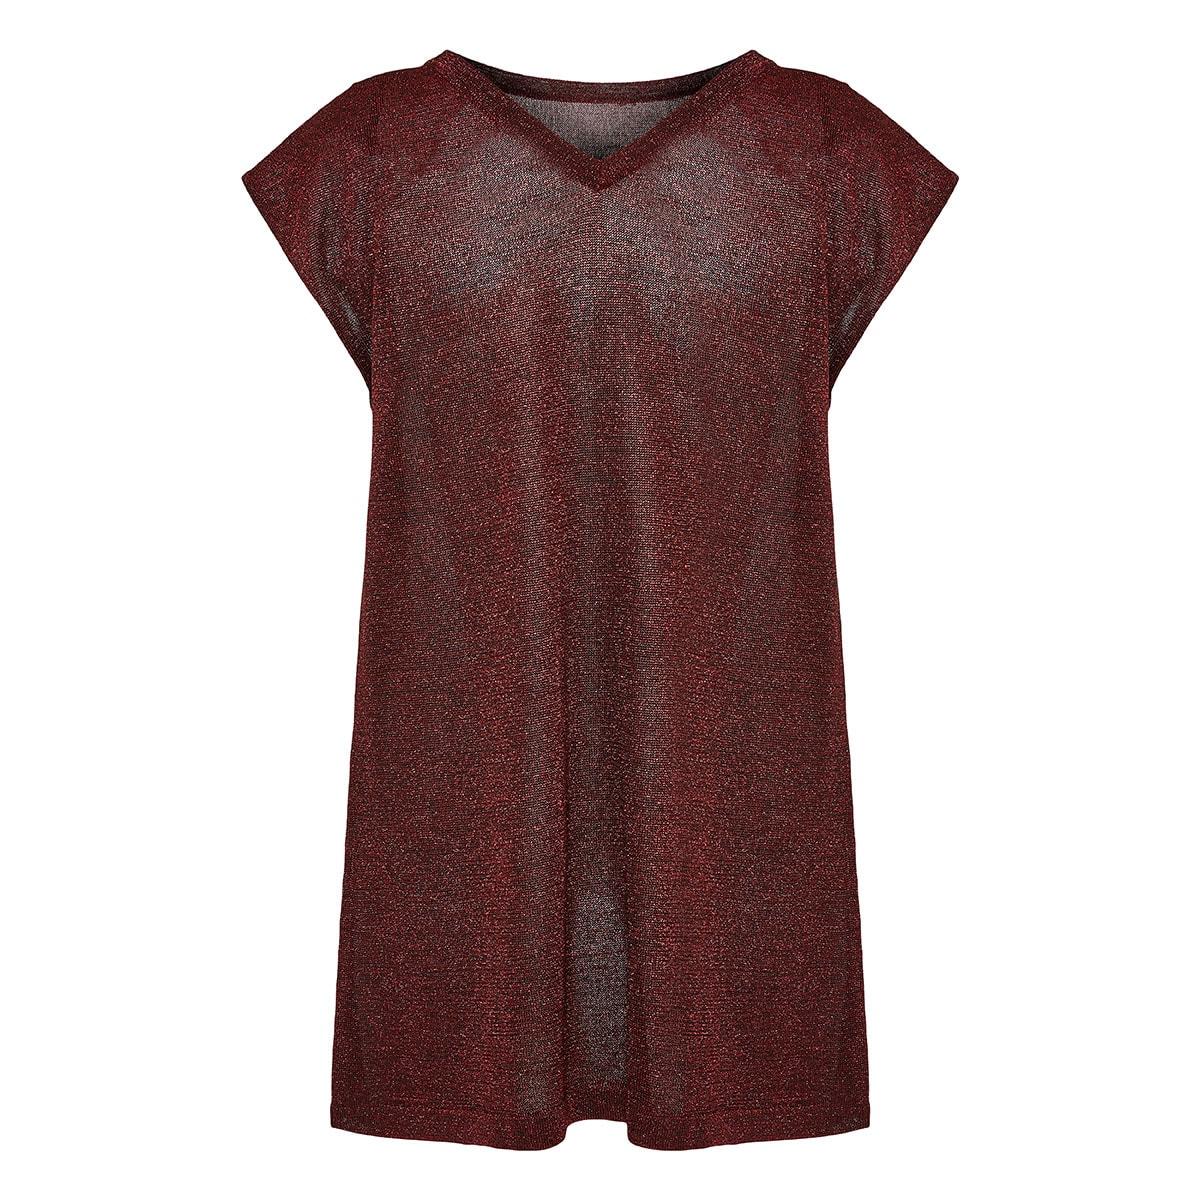 Longline lurex t-shirt